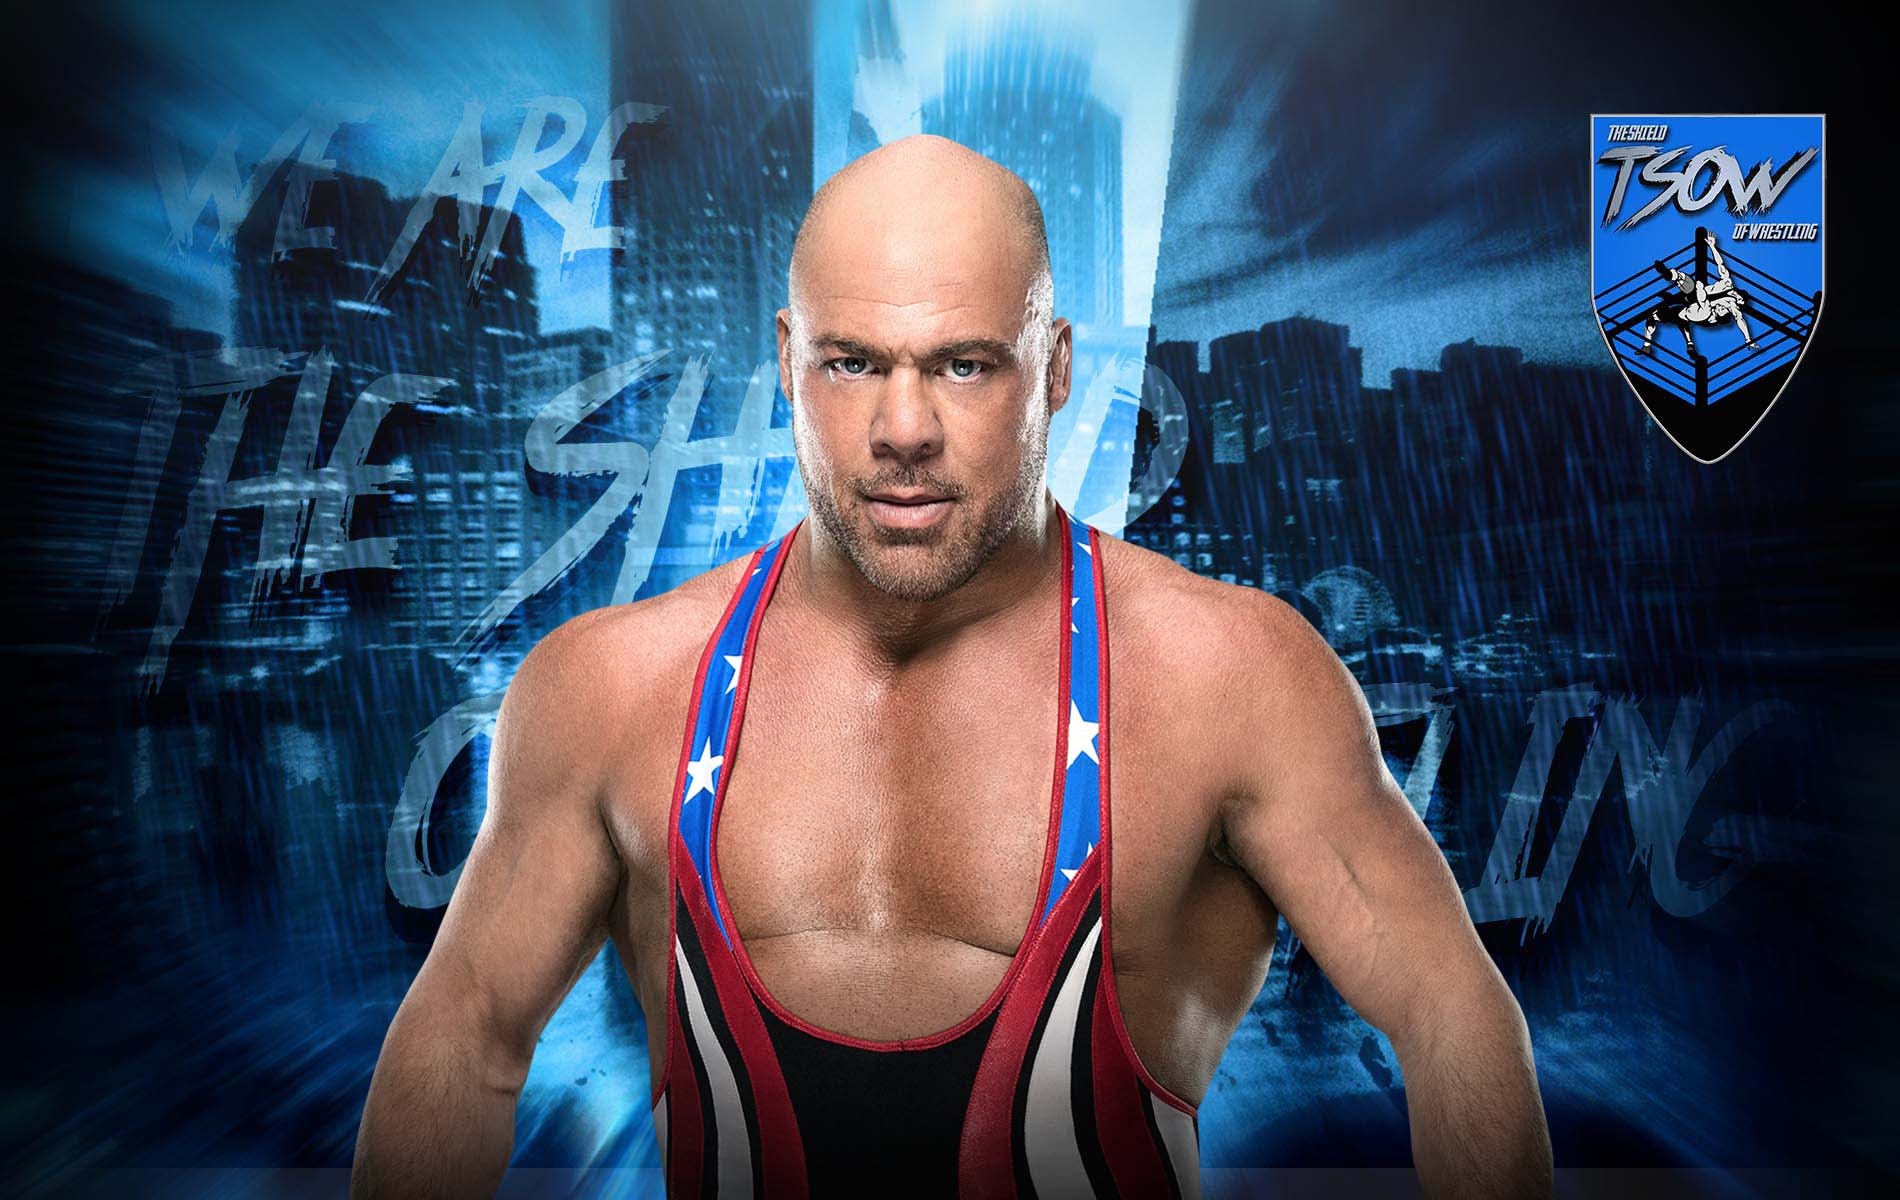 Kurt Angle critica l'attuale team creativo WWE